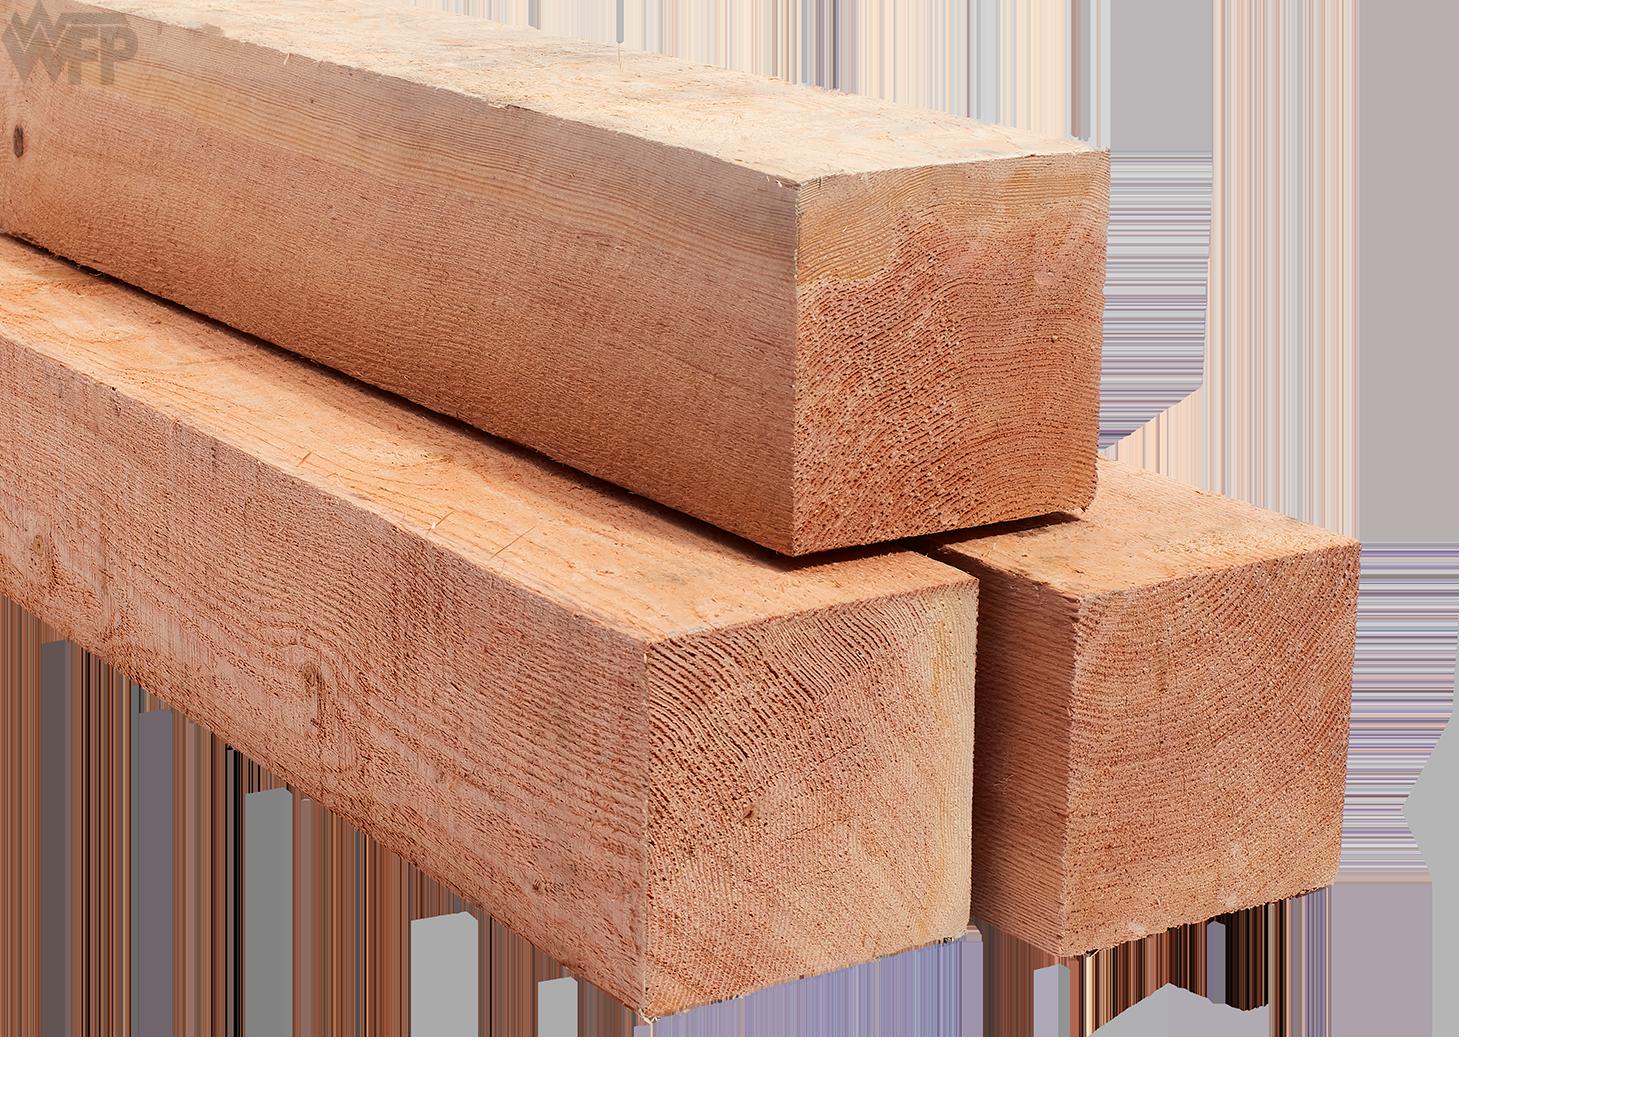 WFP_SRC_DF-Timber-FOHC_6x6_0004_A